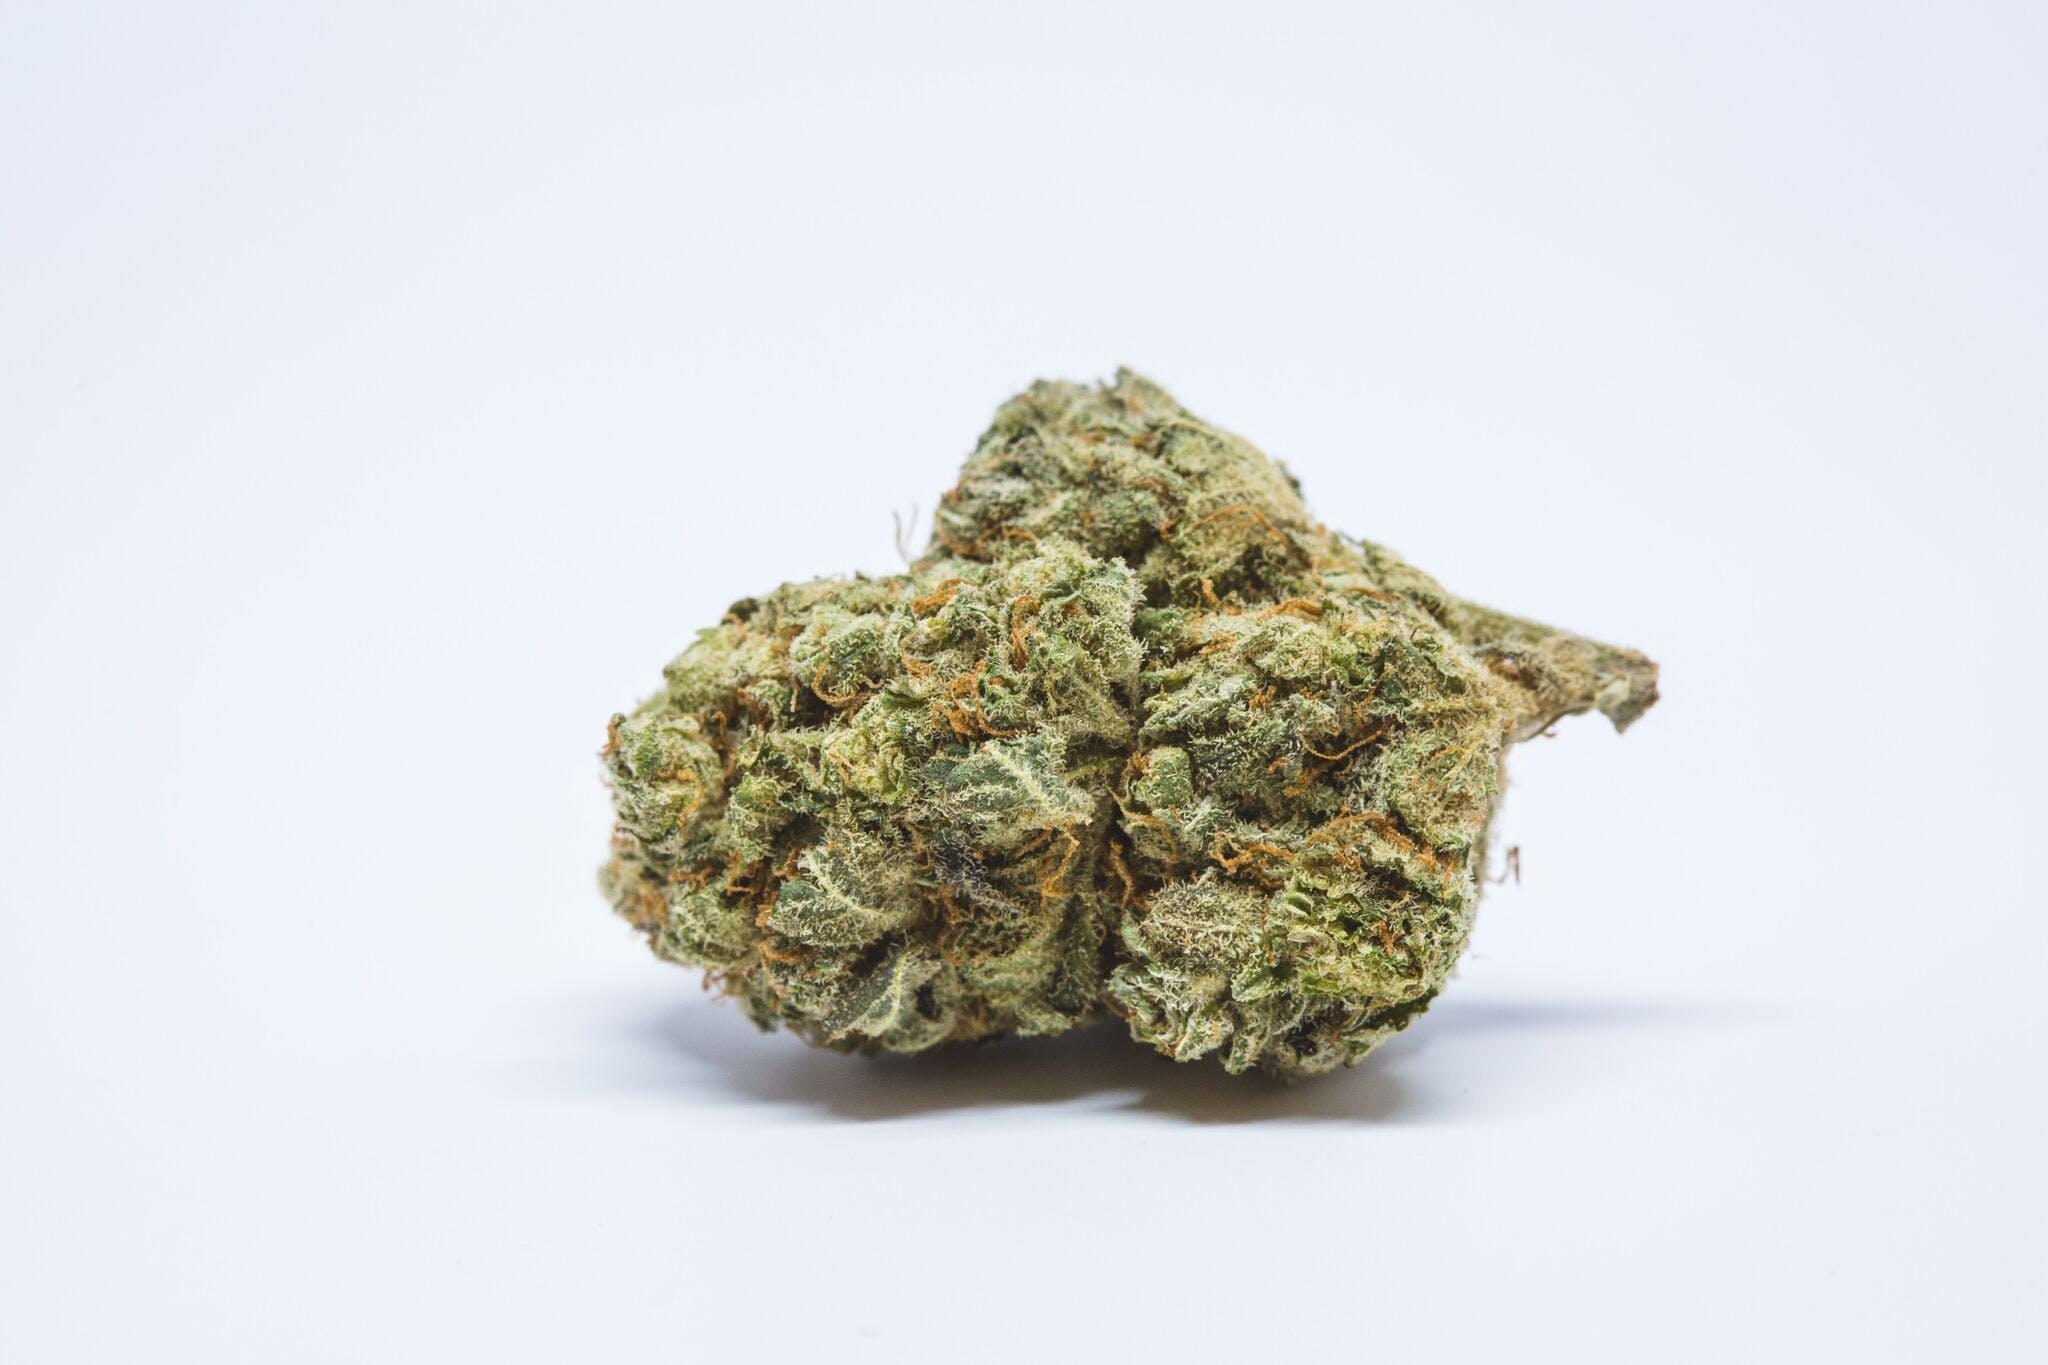 Cinderella's Dream Weed; Cinderella's Dream Cannabis Strain; Cinderella's Dream Hybrid Marijuana Strain